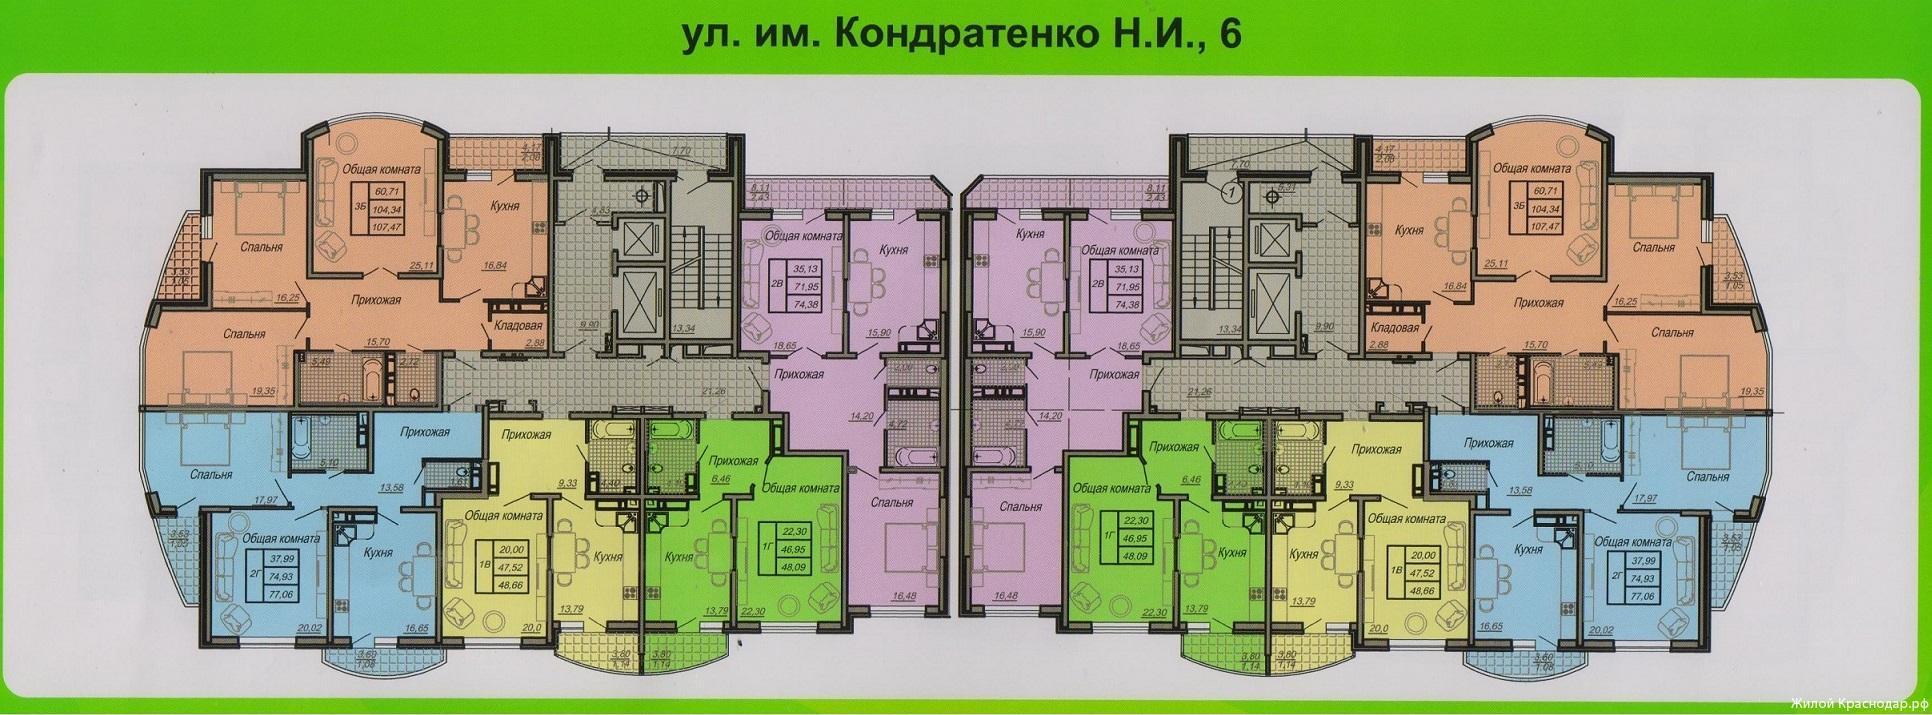 Планировки ЖК Кондратенко, 6 Краснодар | план - 1